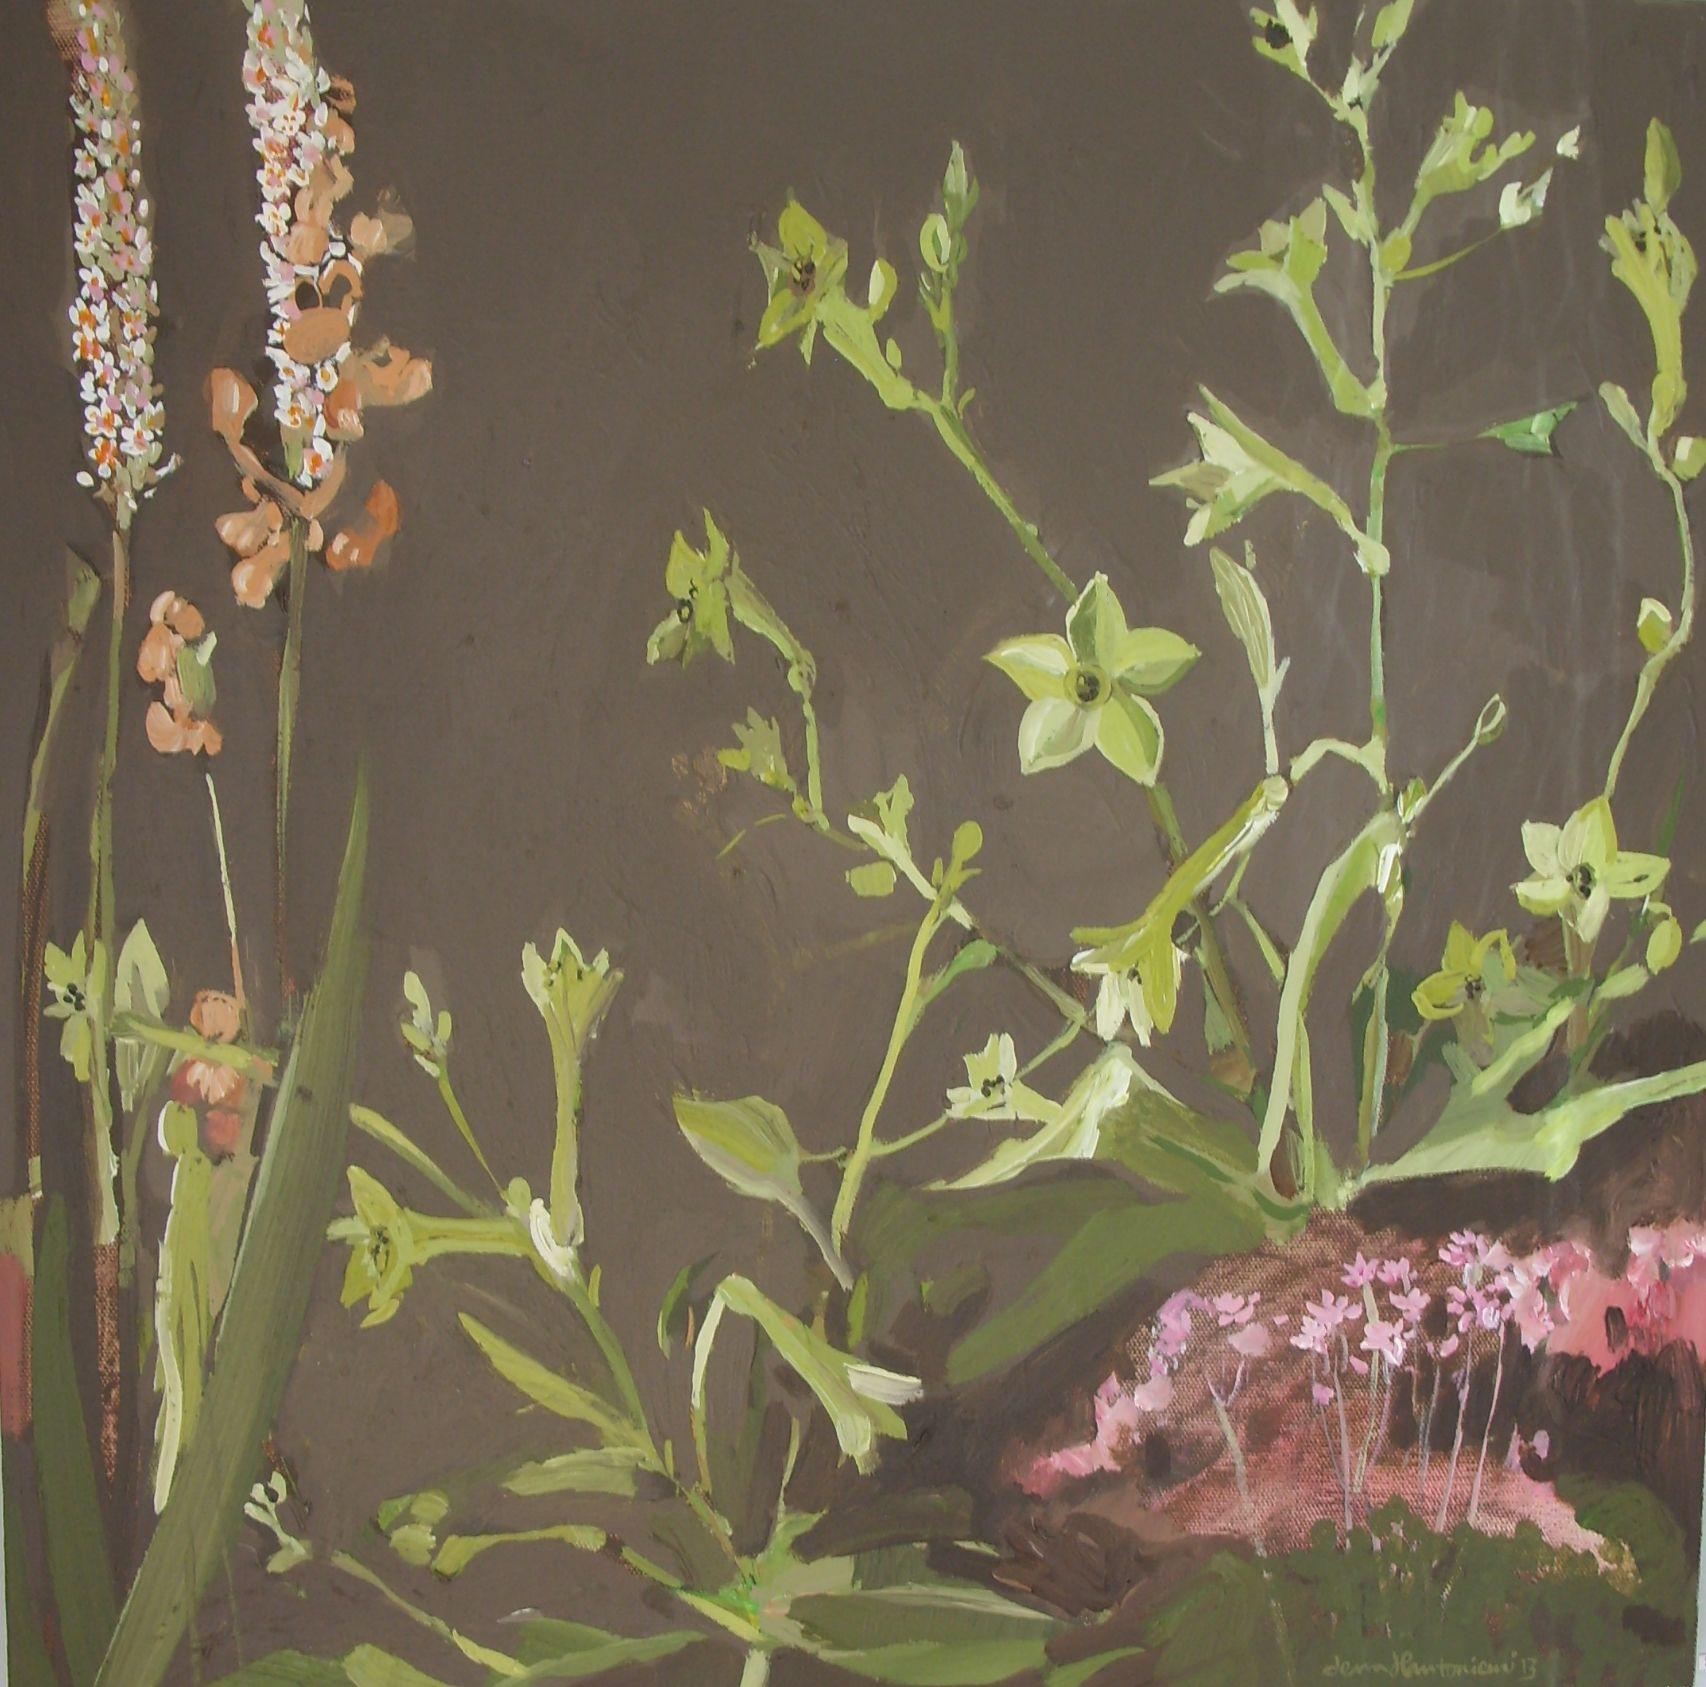 Tobacco painting by Lena Hautoniemi